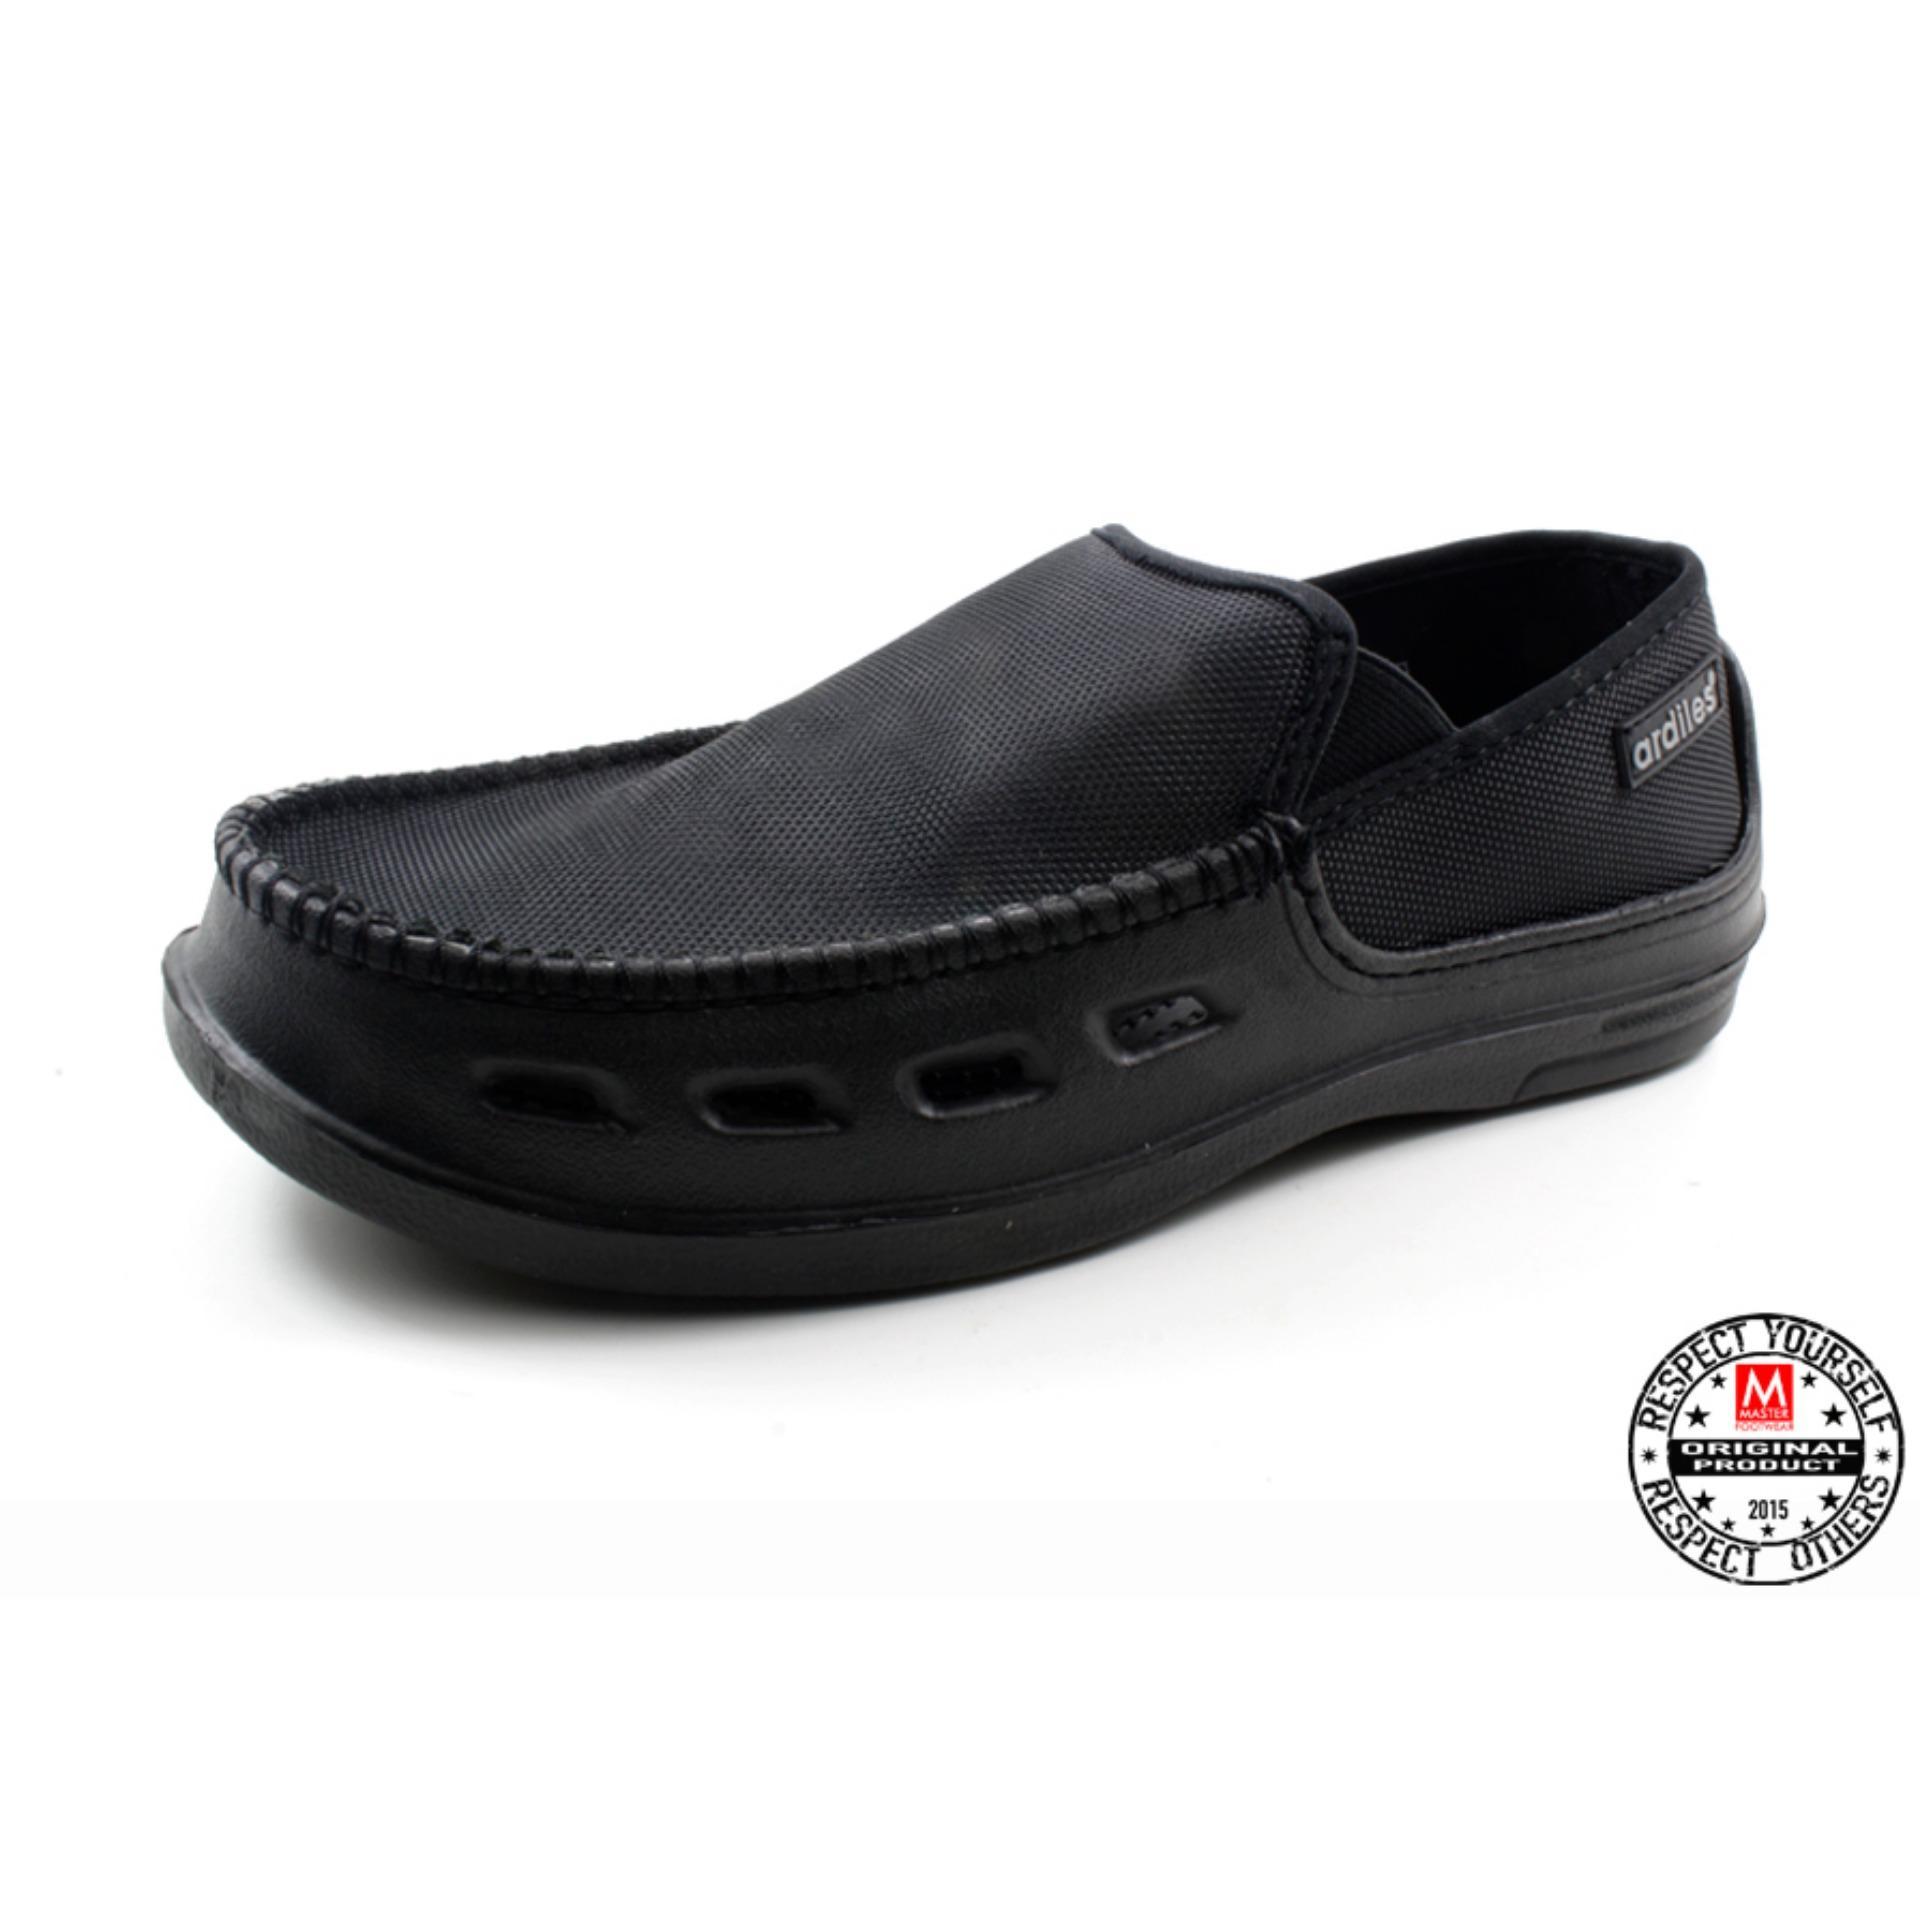 New Casual Shoes From Ardiles Sepatu Sandal Cartz Blue Roberto Slip On Pria Mario Black